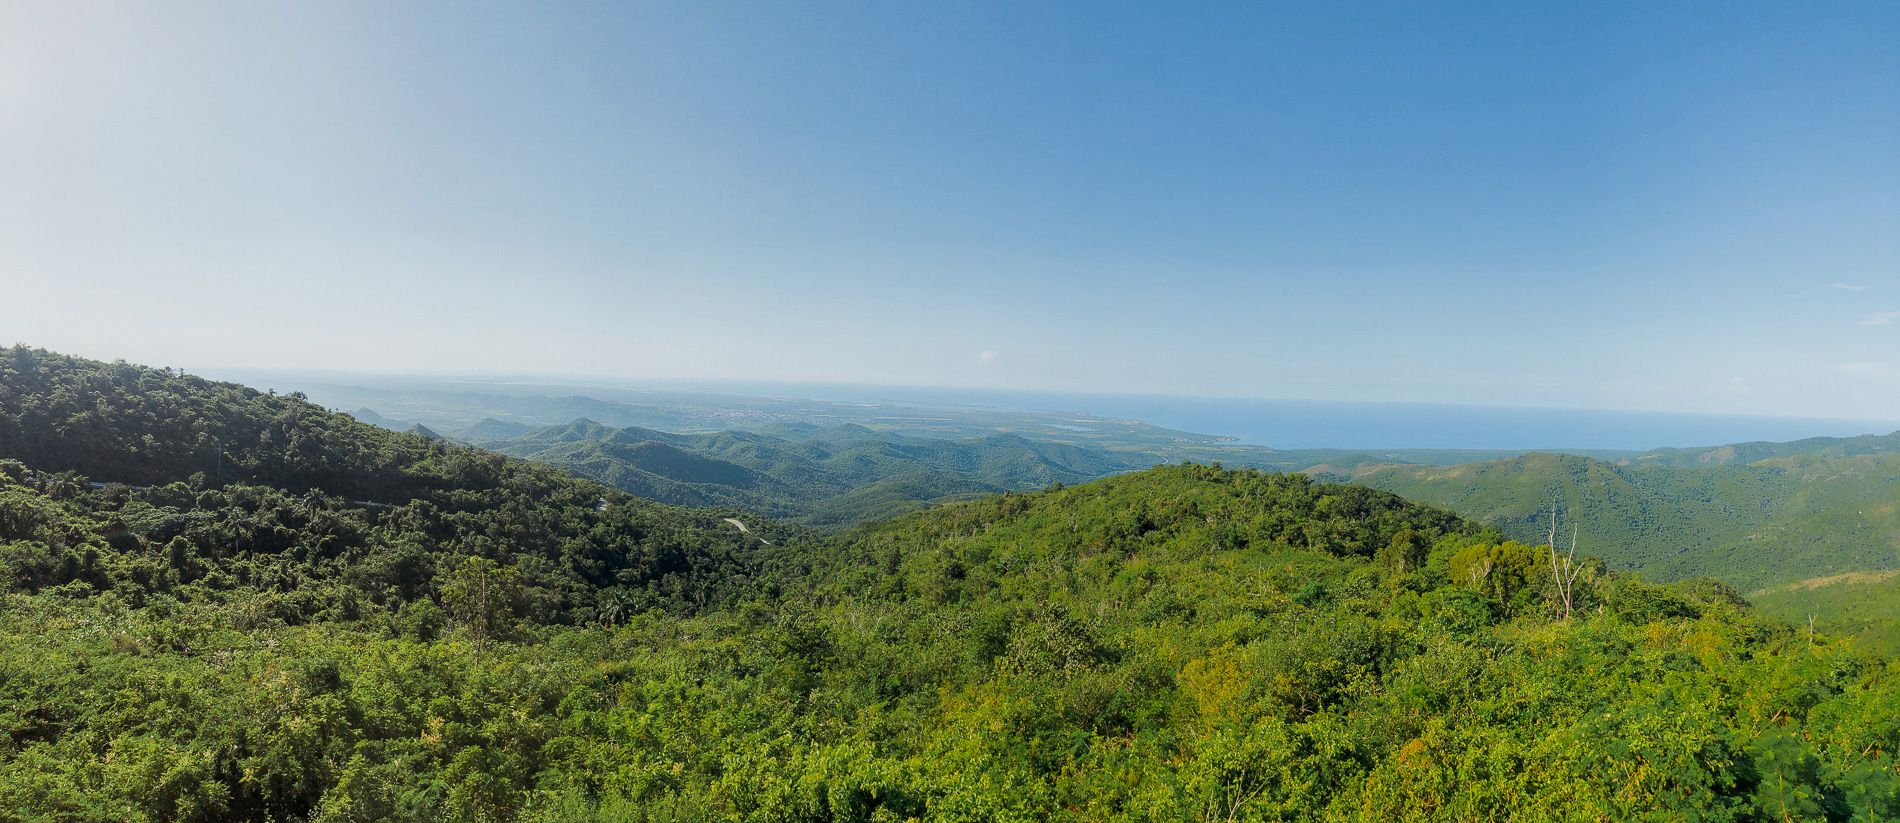 Cuba | Trinidad | Parc topes de collantes